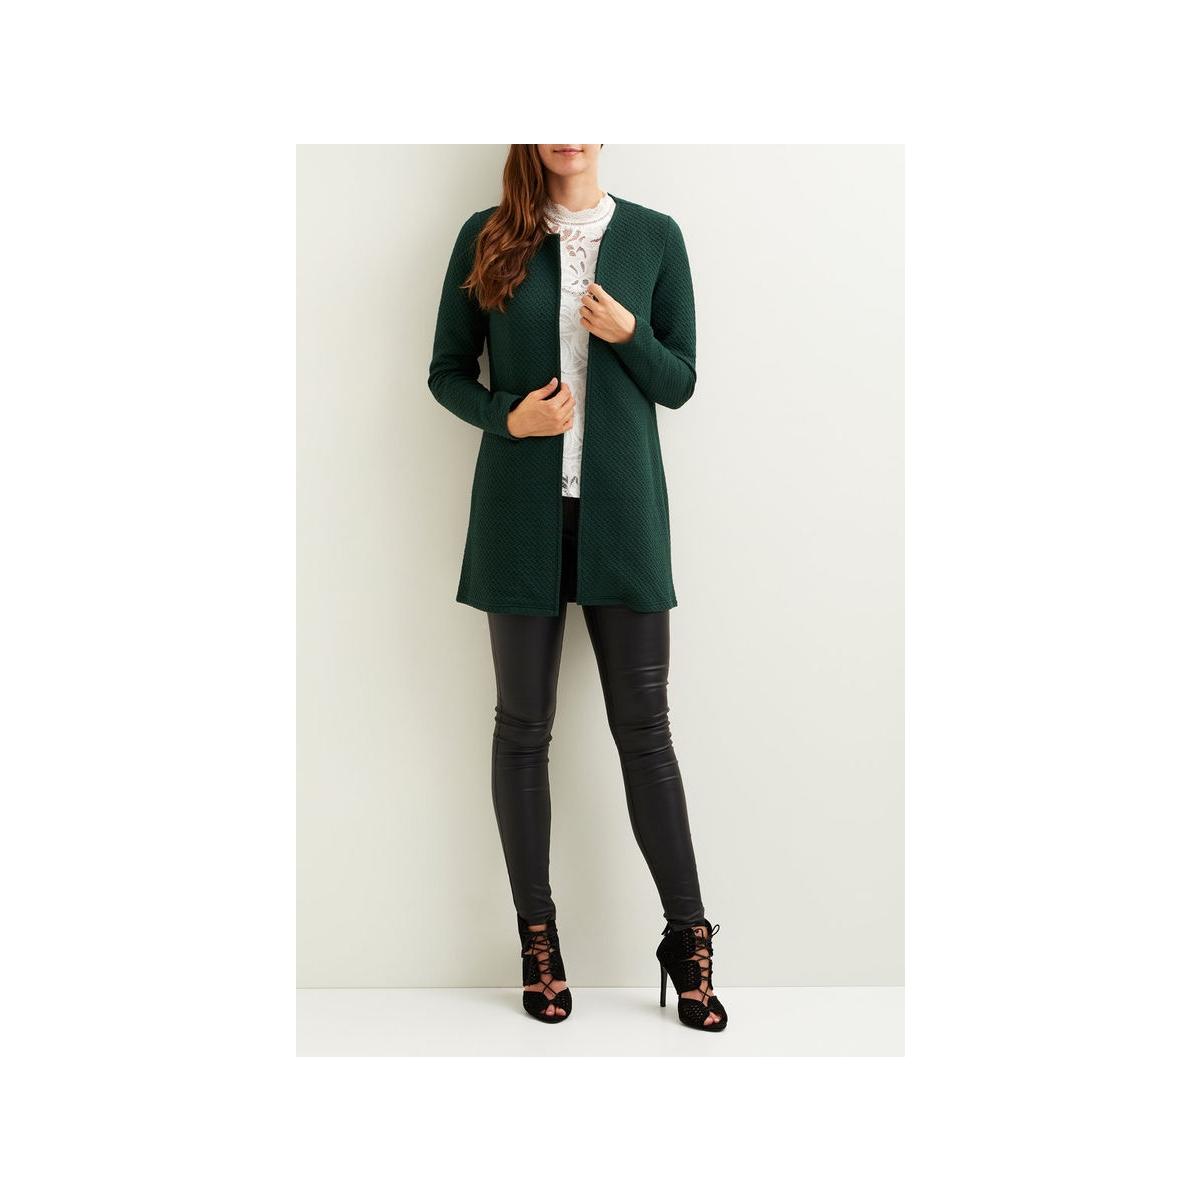 vinaja new long jacket-fav 14043894 vila vest pine grove